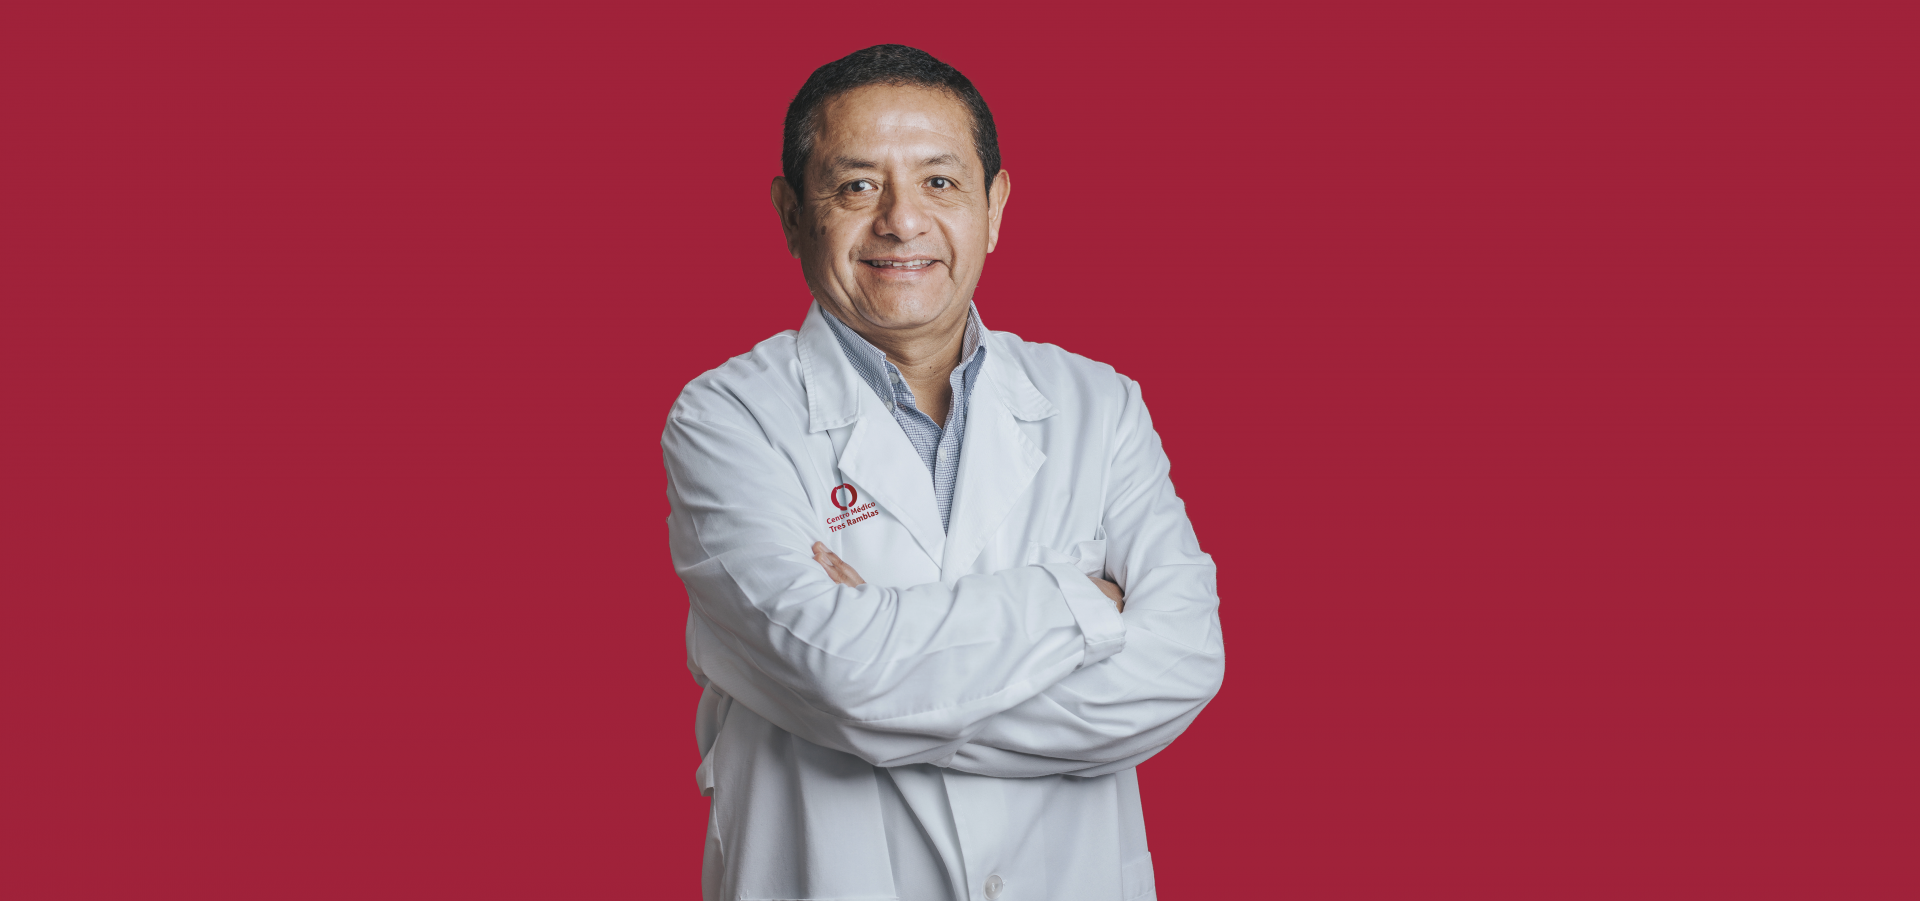 Dr. Valois Francisco Varillas Solano